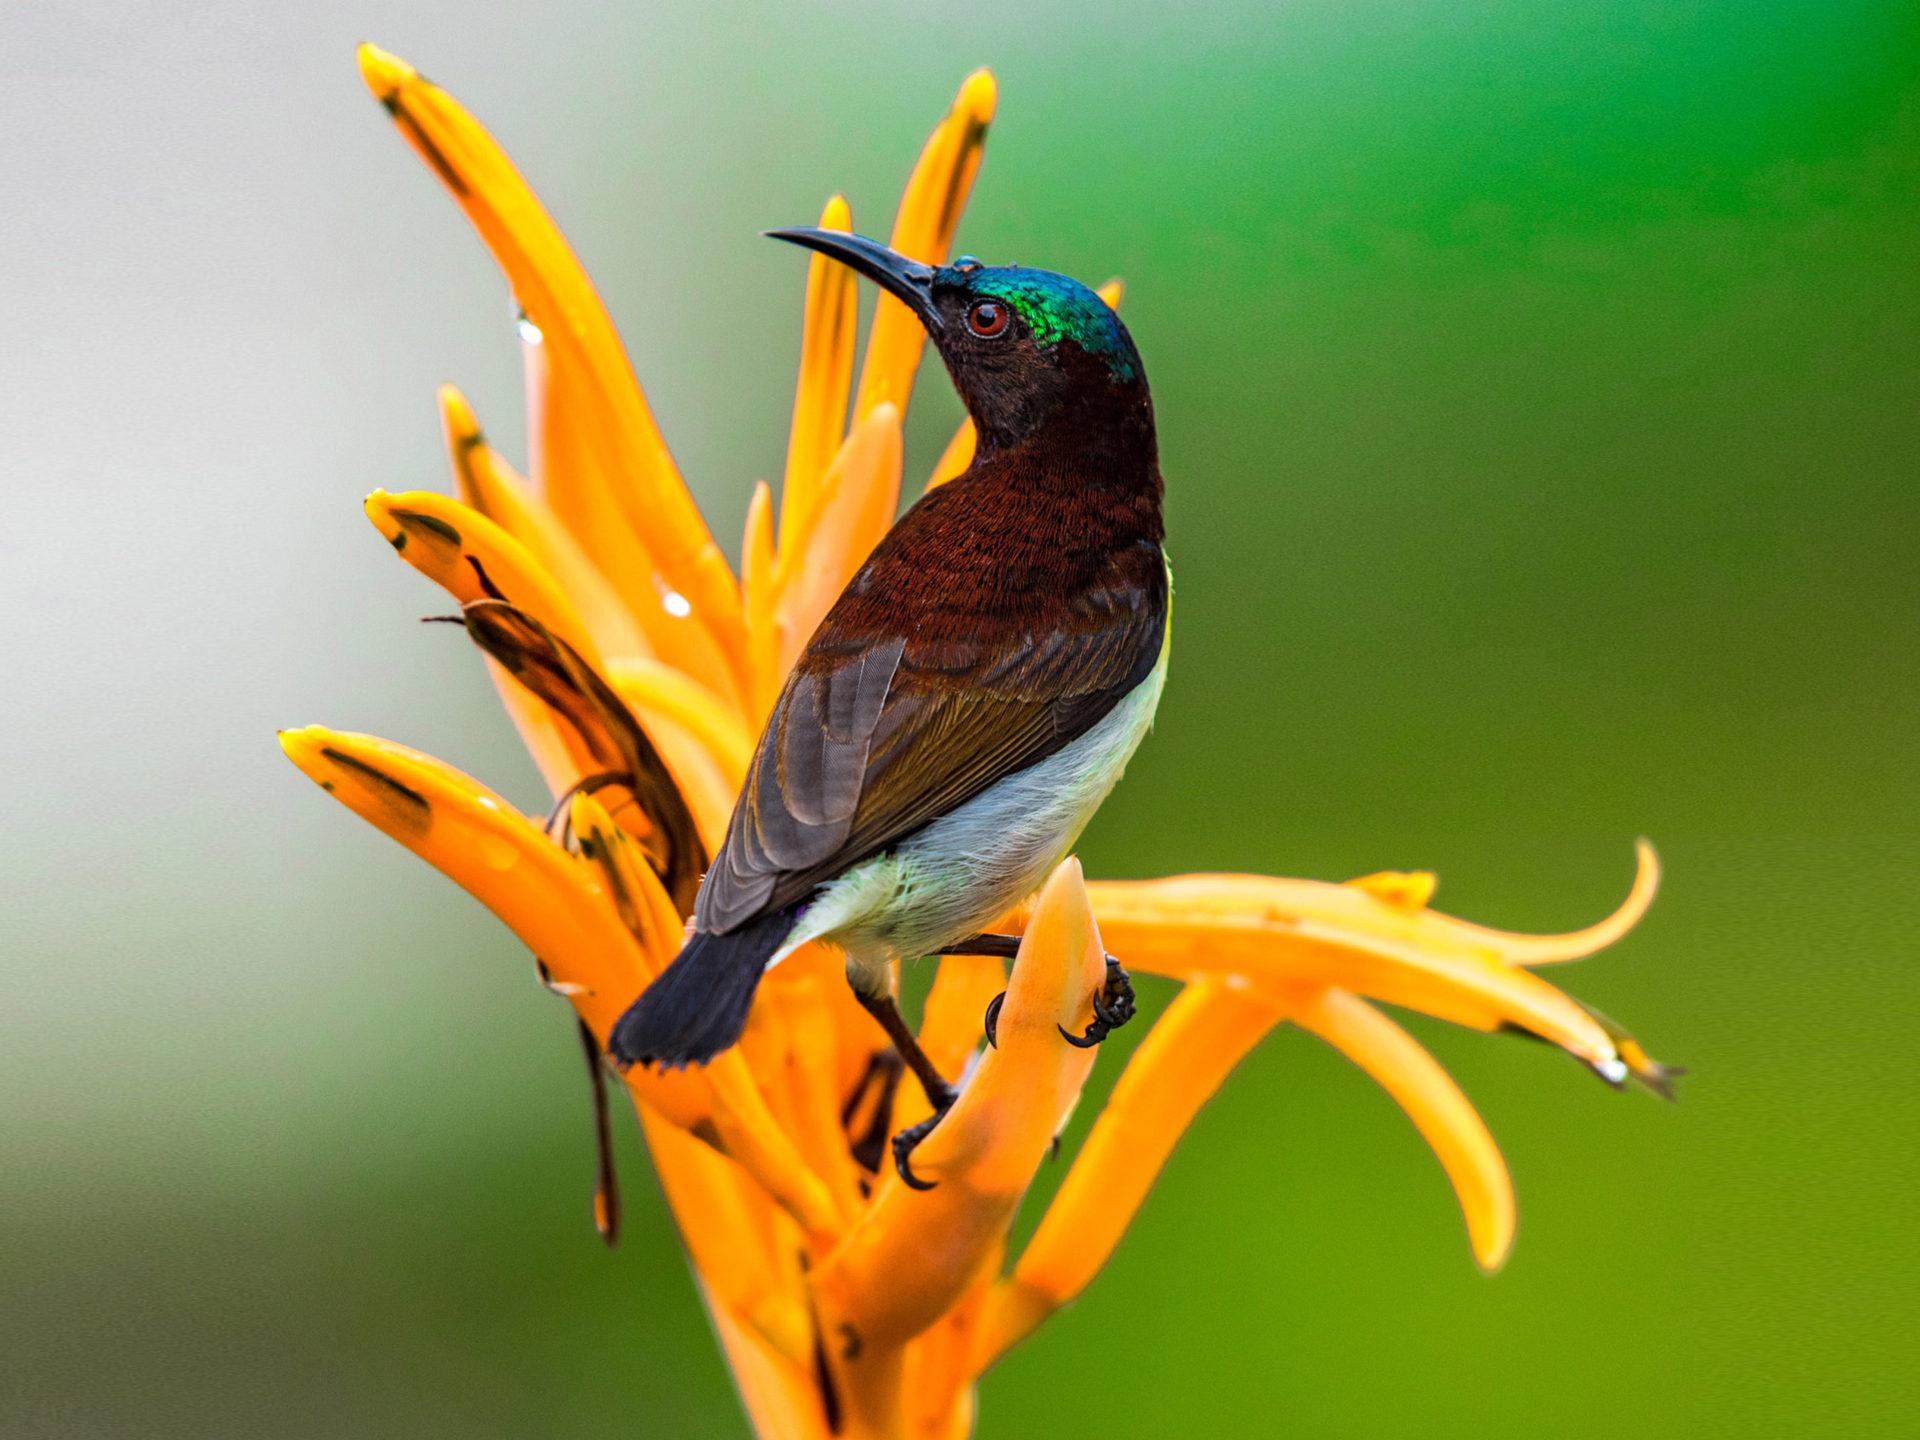 Indian Small Birds Name 1920x1440 Wallpaper Teahub Io